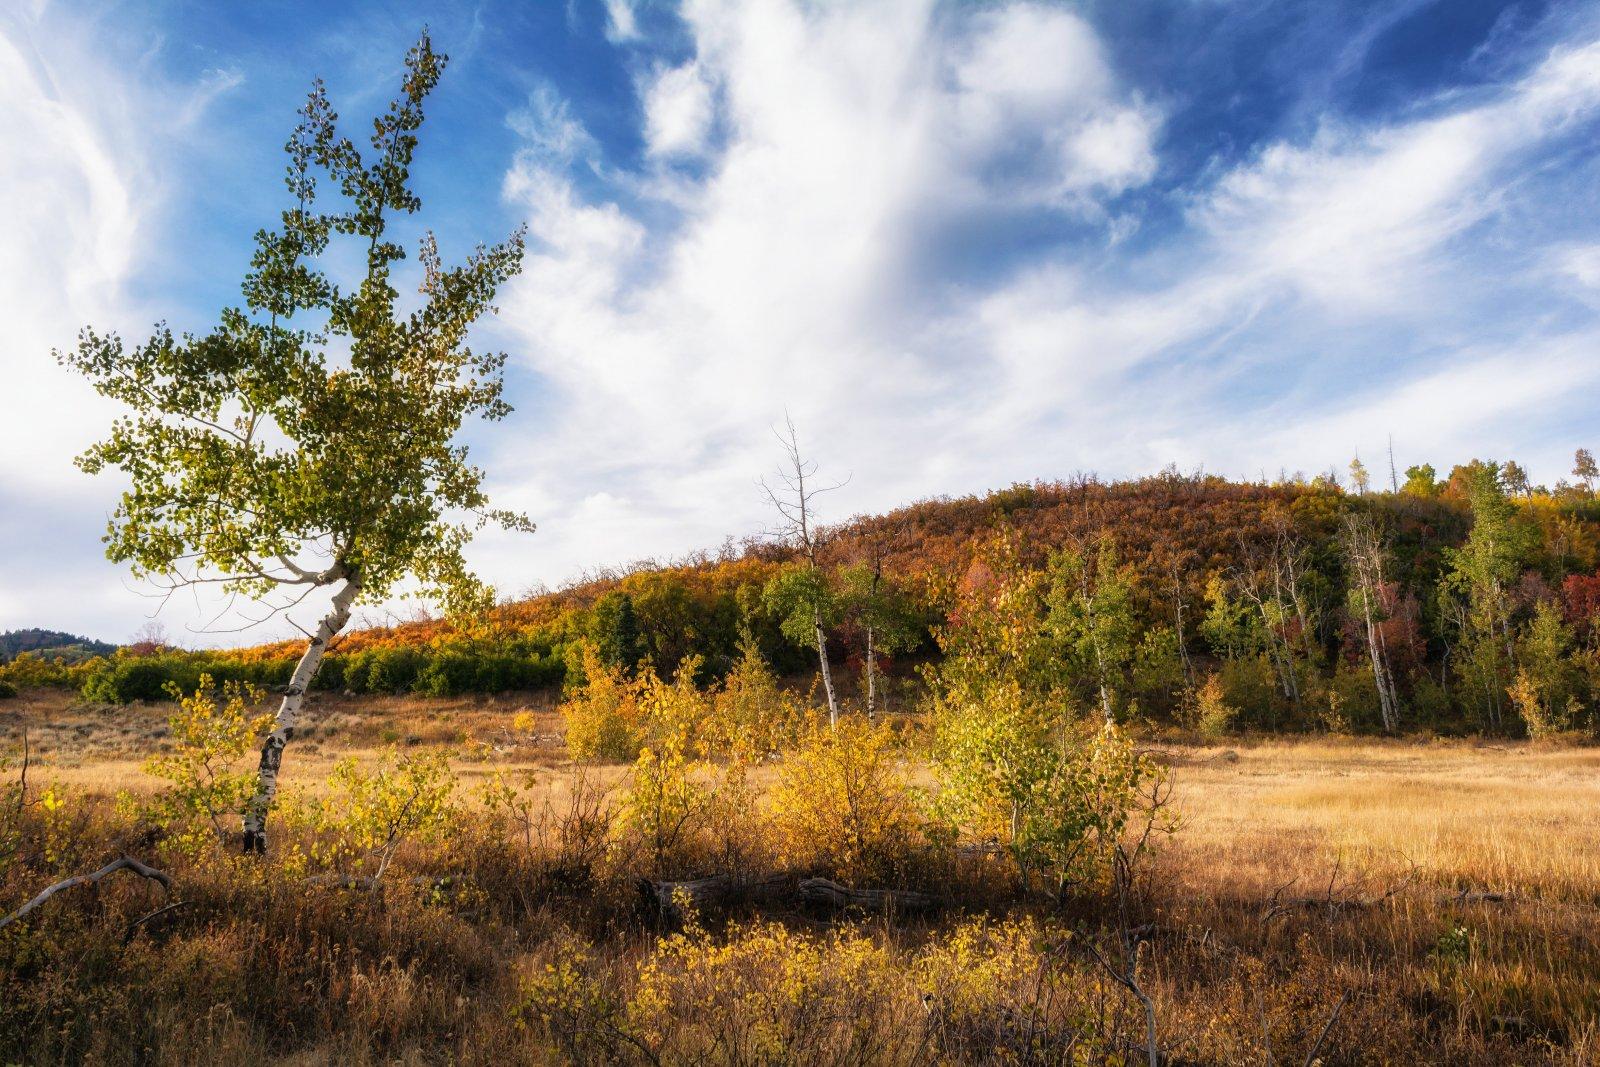 Ridge Autumn Leaves 9-20180468-recipe-sh.jpg